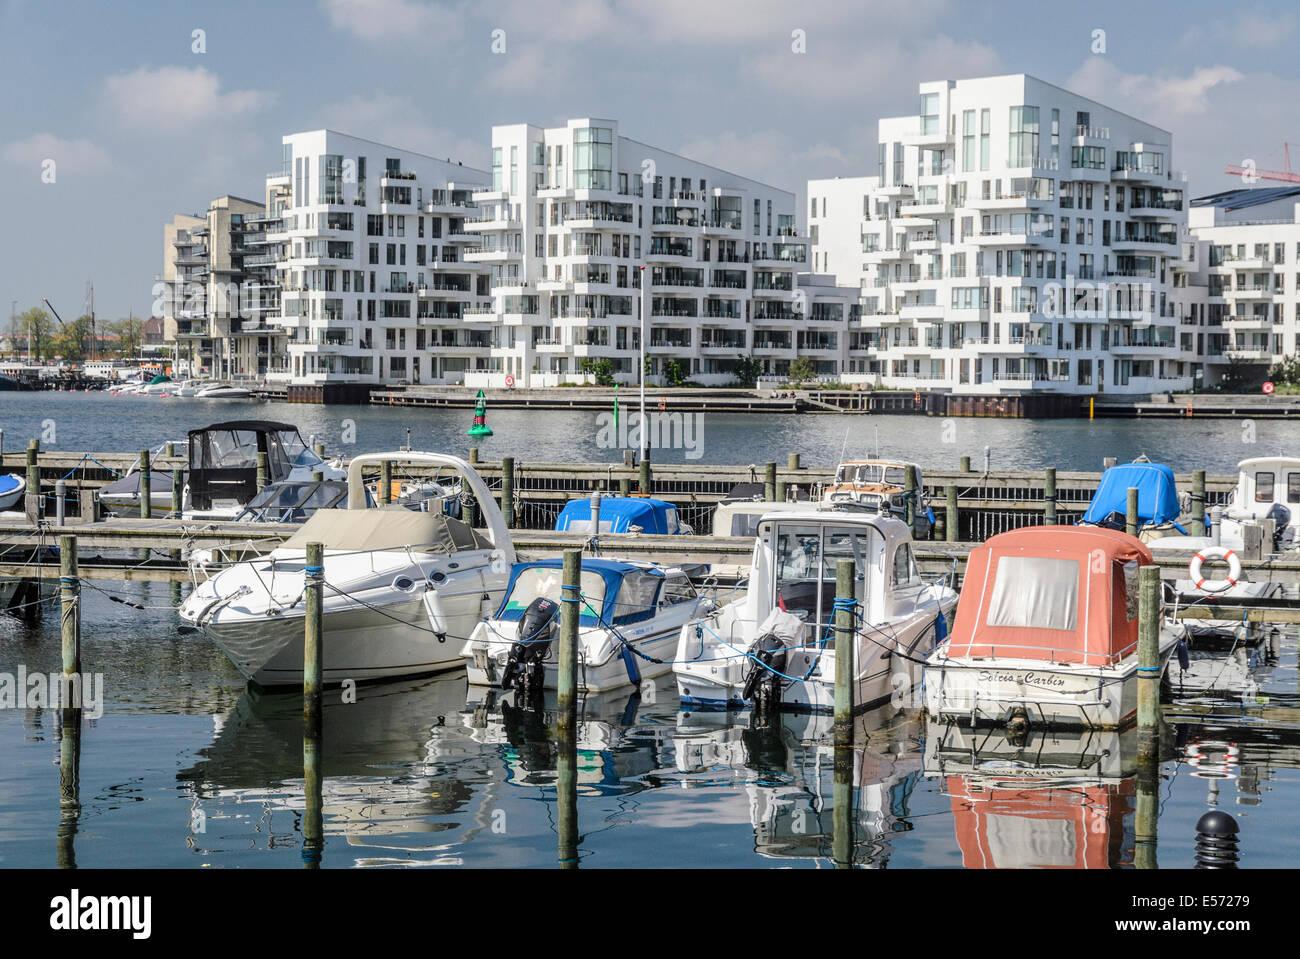 Havneholmen Moderno Apartamento Casas Copenhague Dinamarca Foto